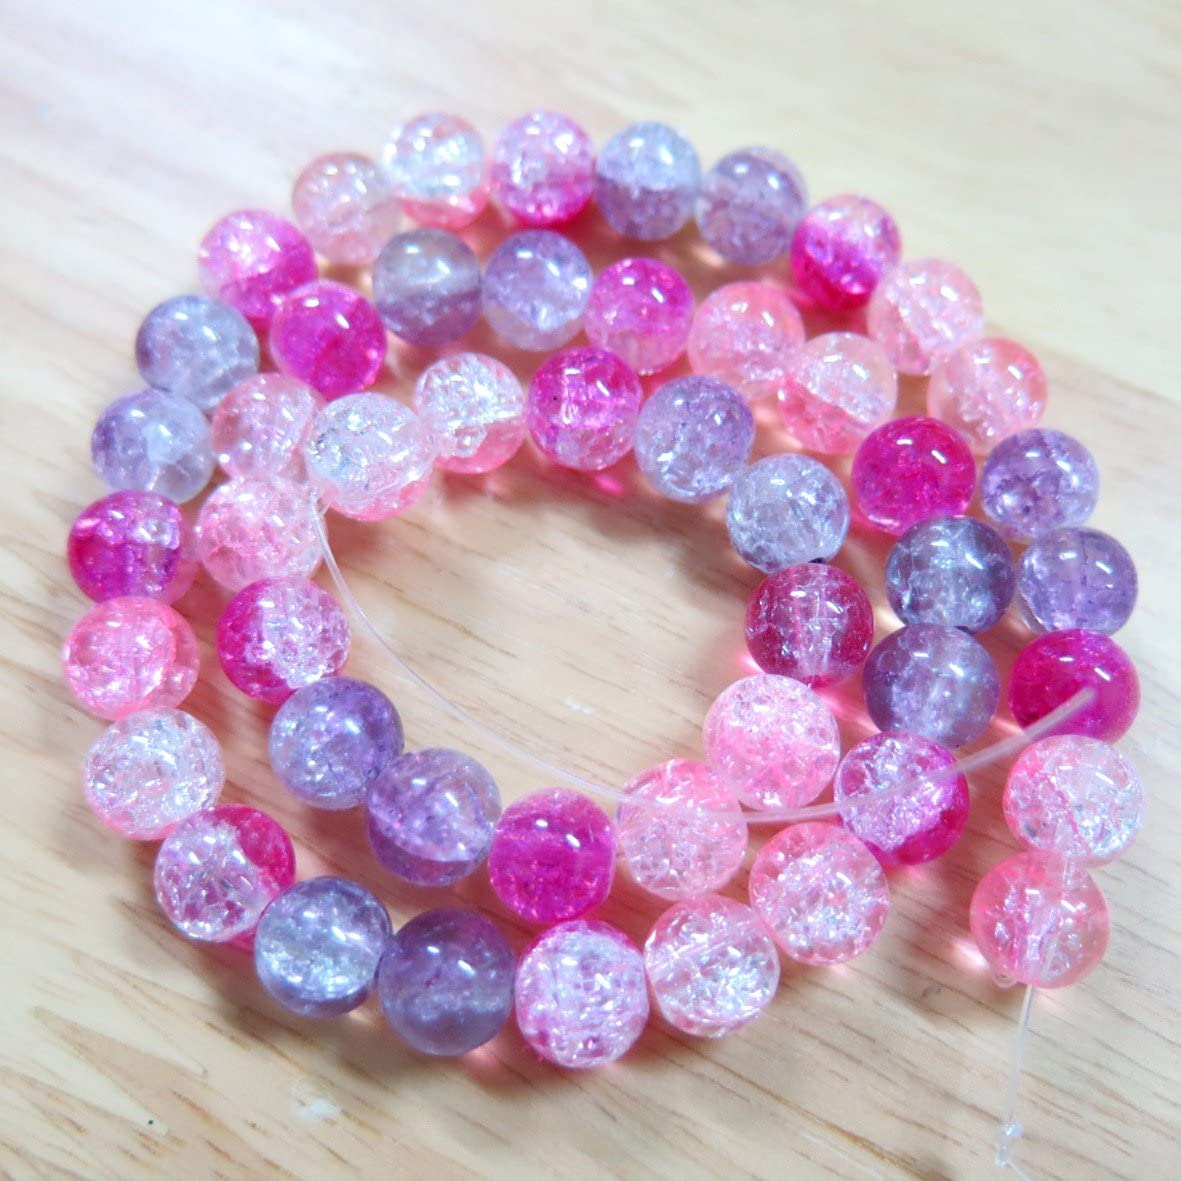 BSI - Mix Color 2-Tone Crackle Lampwork Glass - Loose Beads (50p